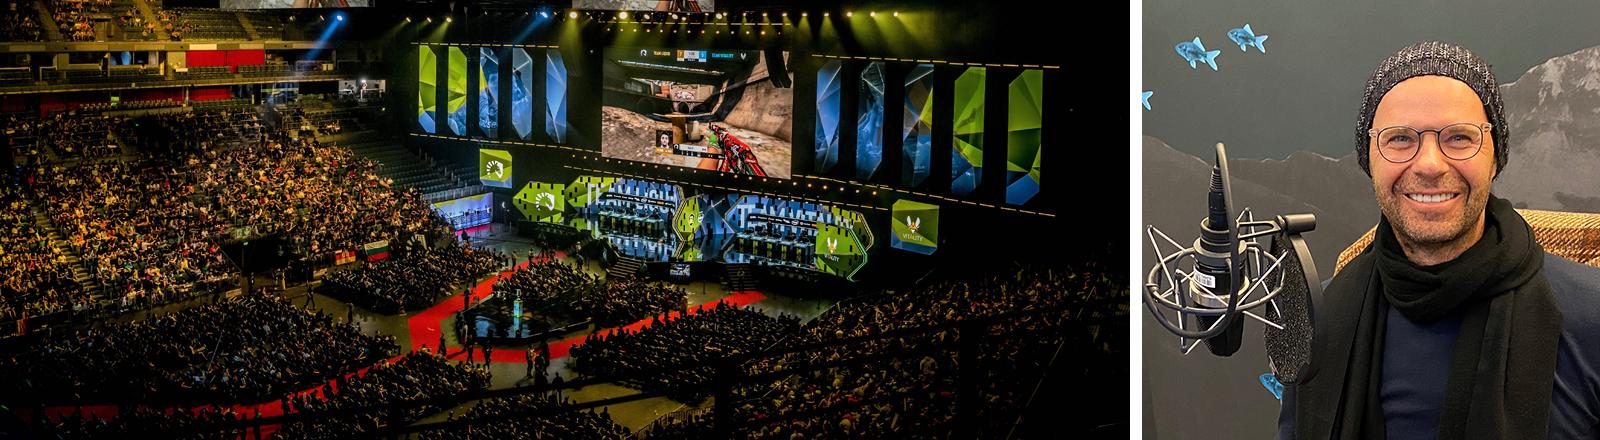 Links: Blick in die Lanxess Arena Köln währens eines Counter-Strike-Wettkamps 2019, rechts: Jörg Adami im Deutschlandfunk-Nova-Studio